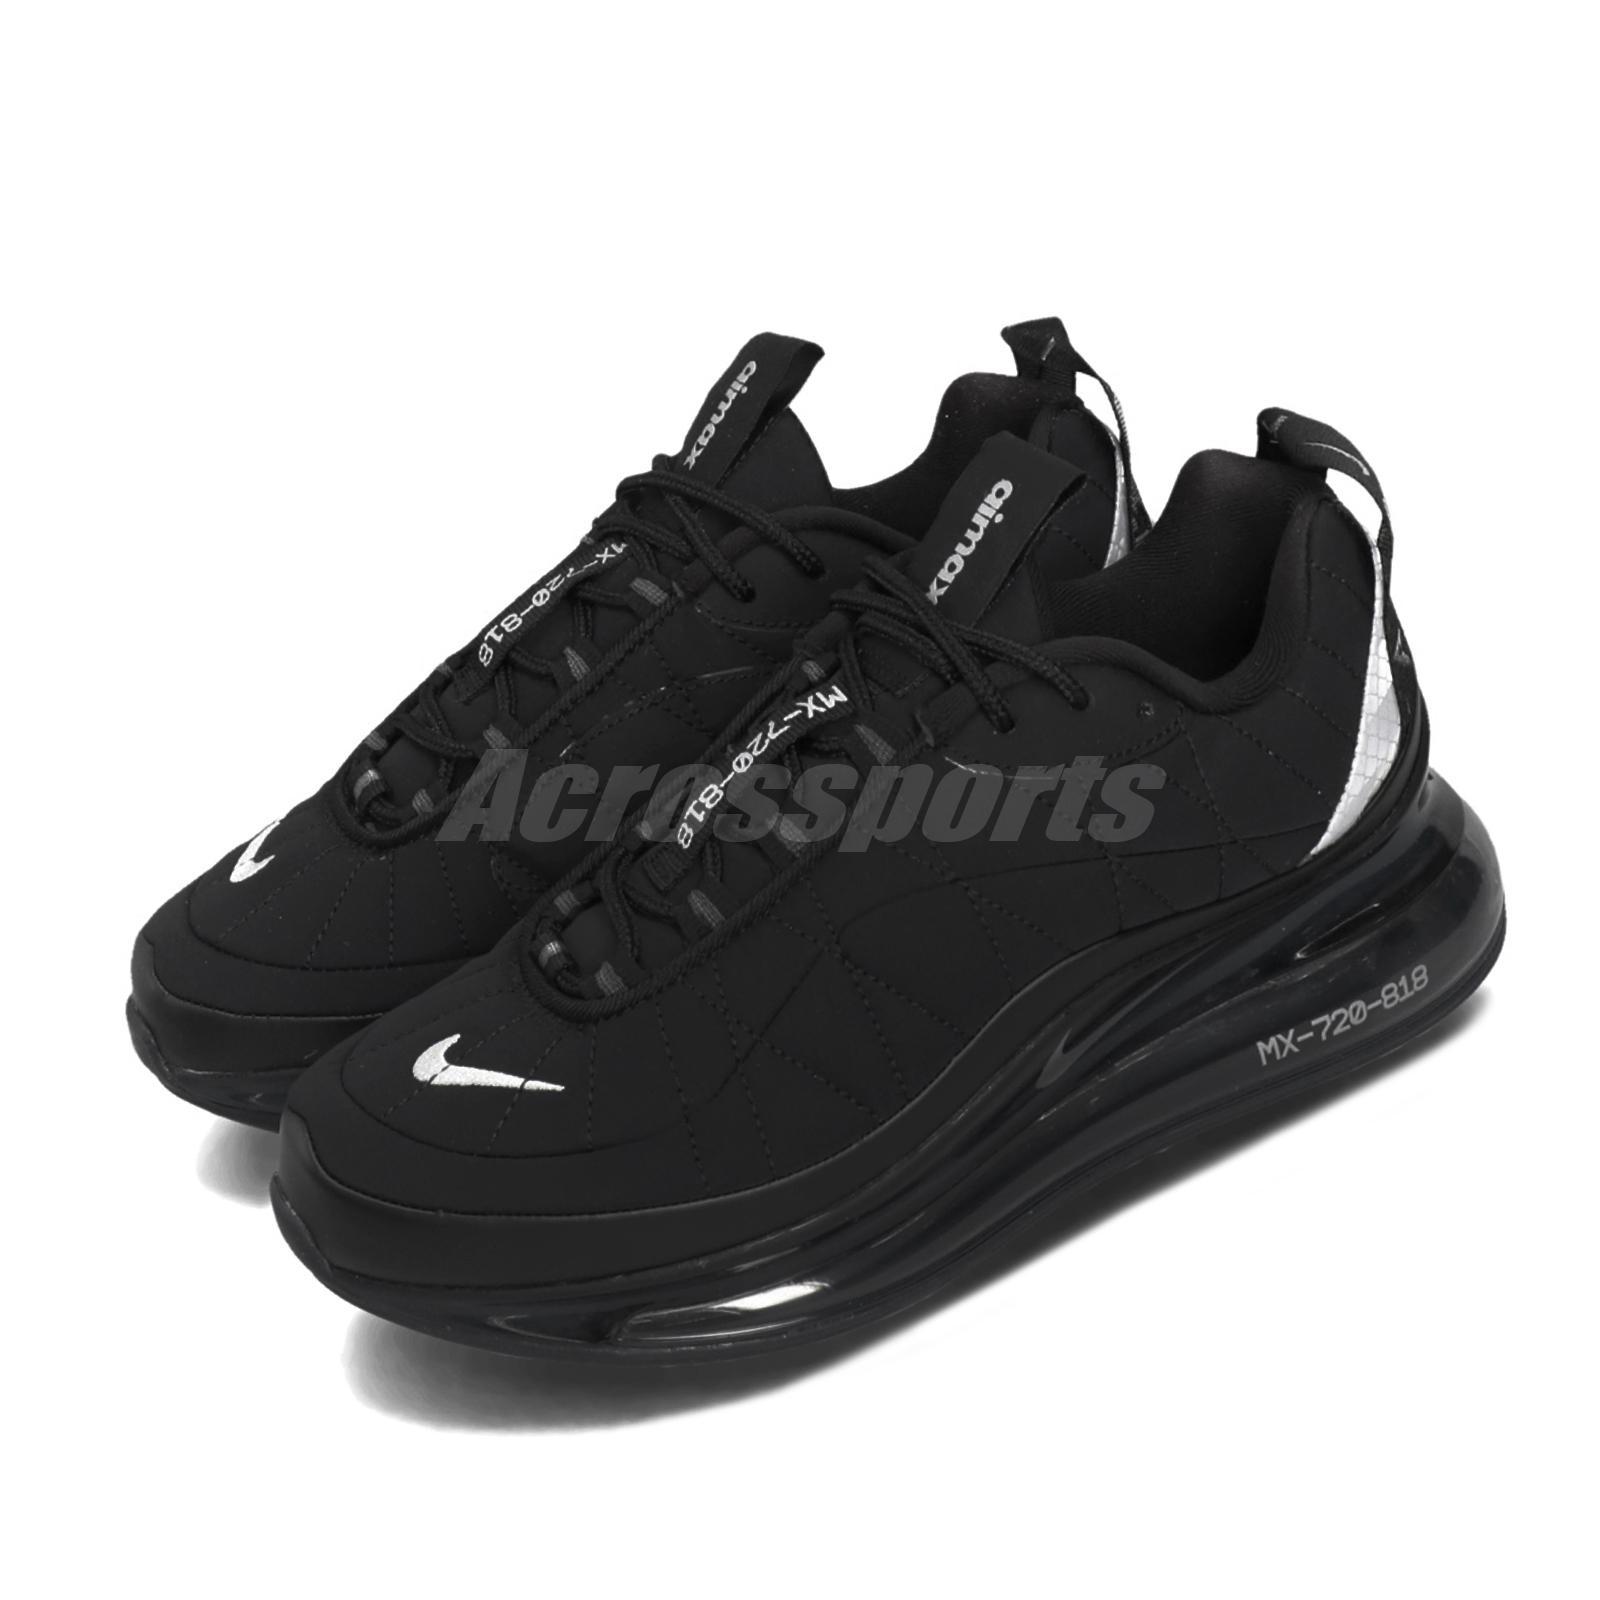 Nike Wmns Mx 720 818 Preto Prata Air Max Feminino Sapatos De